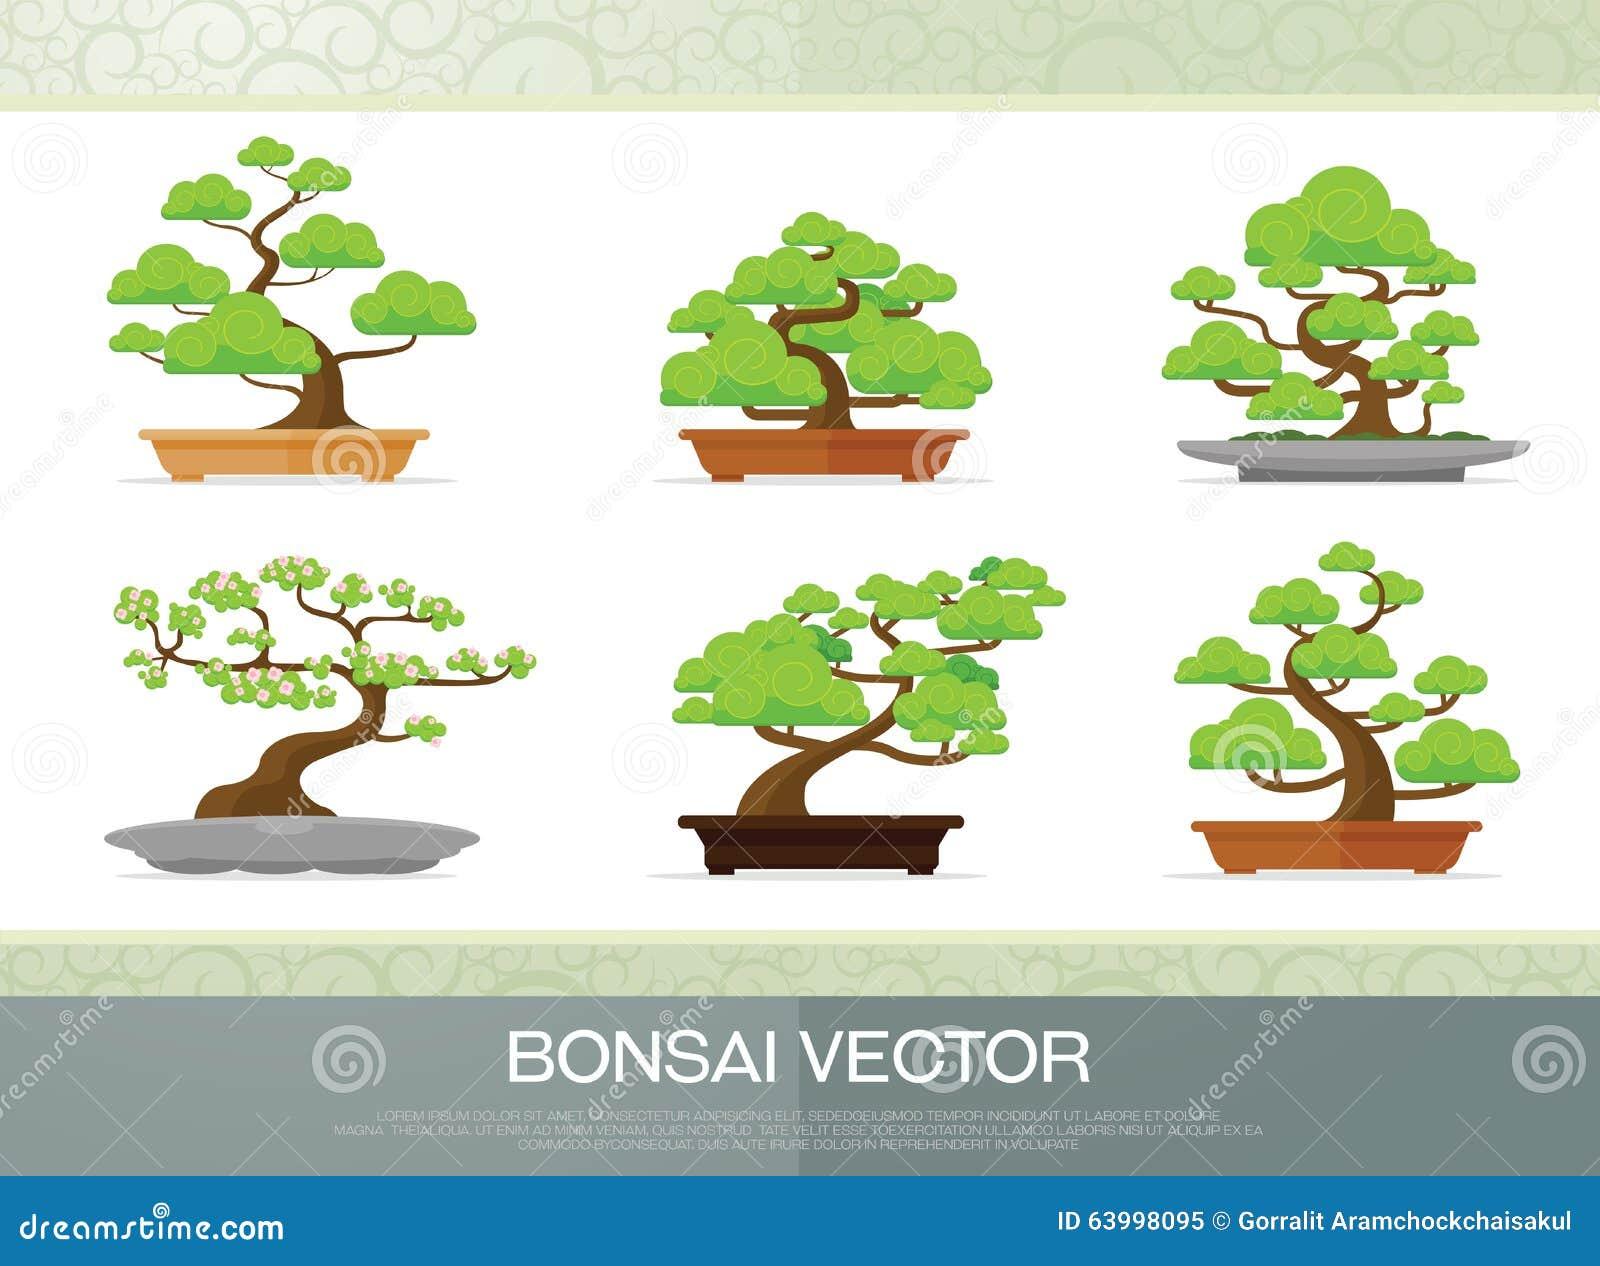 Vector Flat Style Illustration Of Bonsai Tree. Vector ... Bonsai Tree Clipart